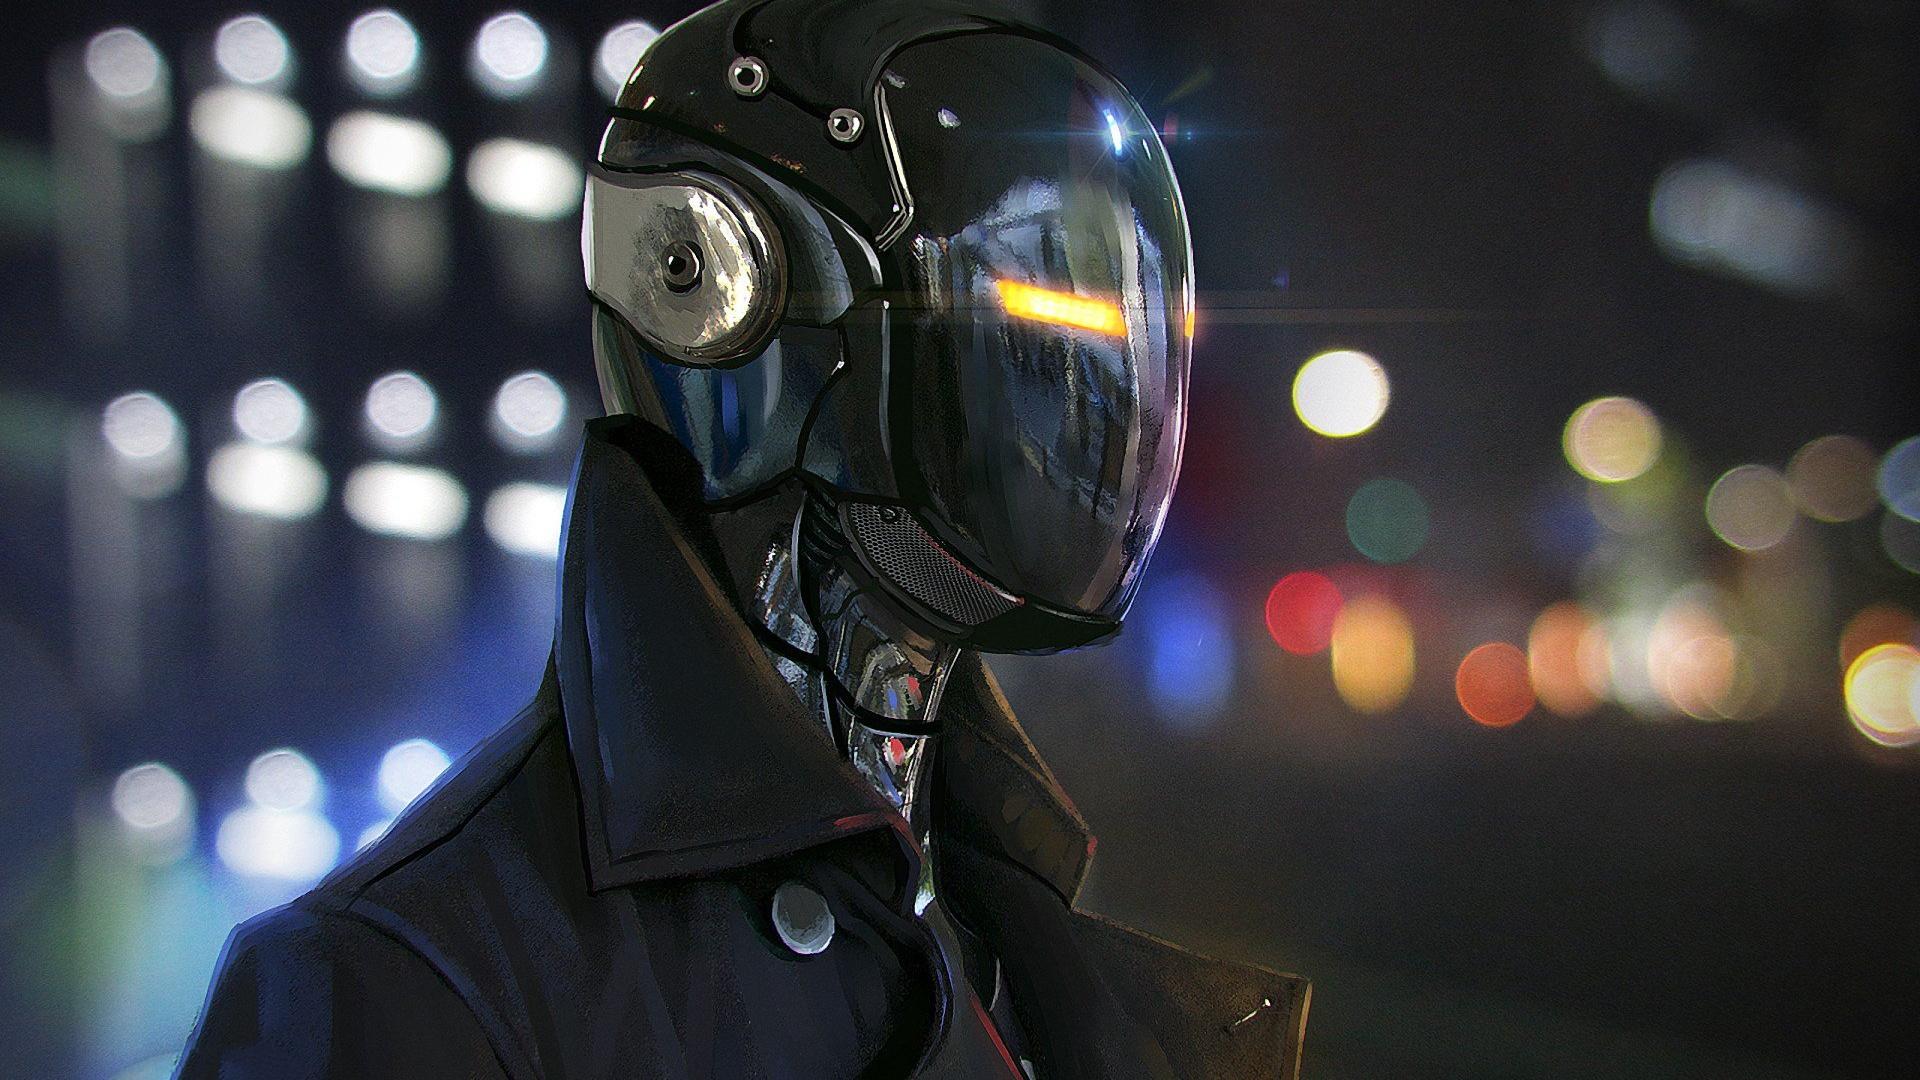 Cyberpunk Mask High Quality